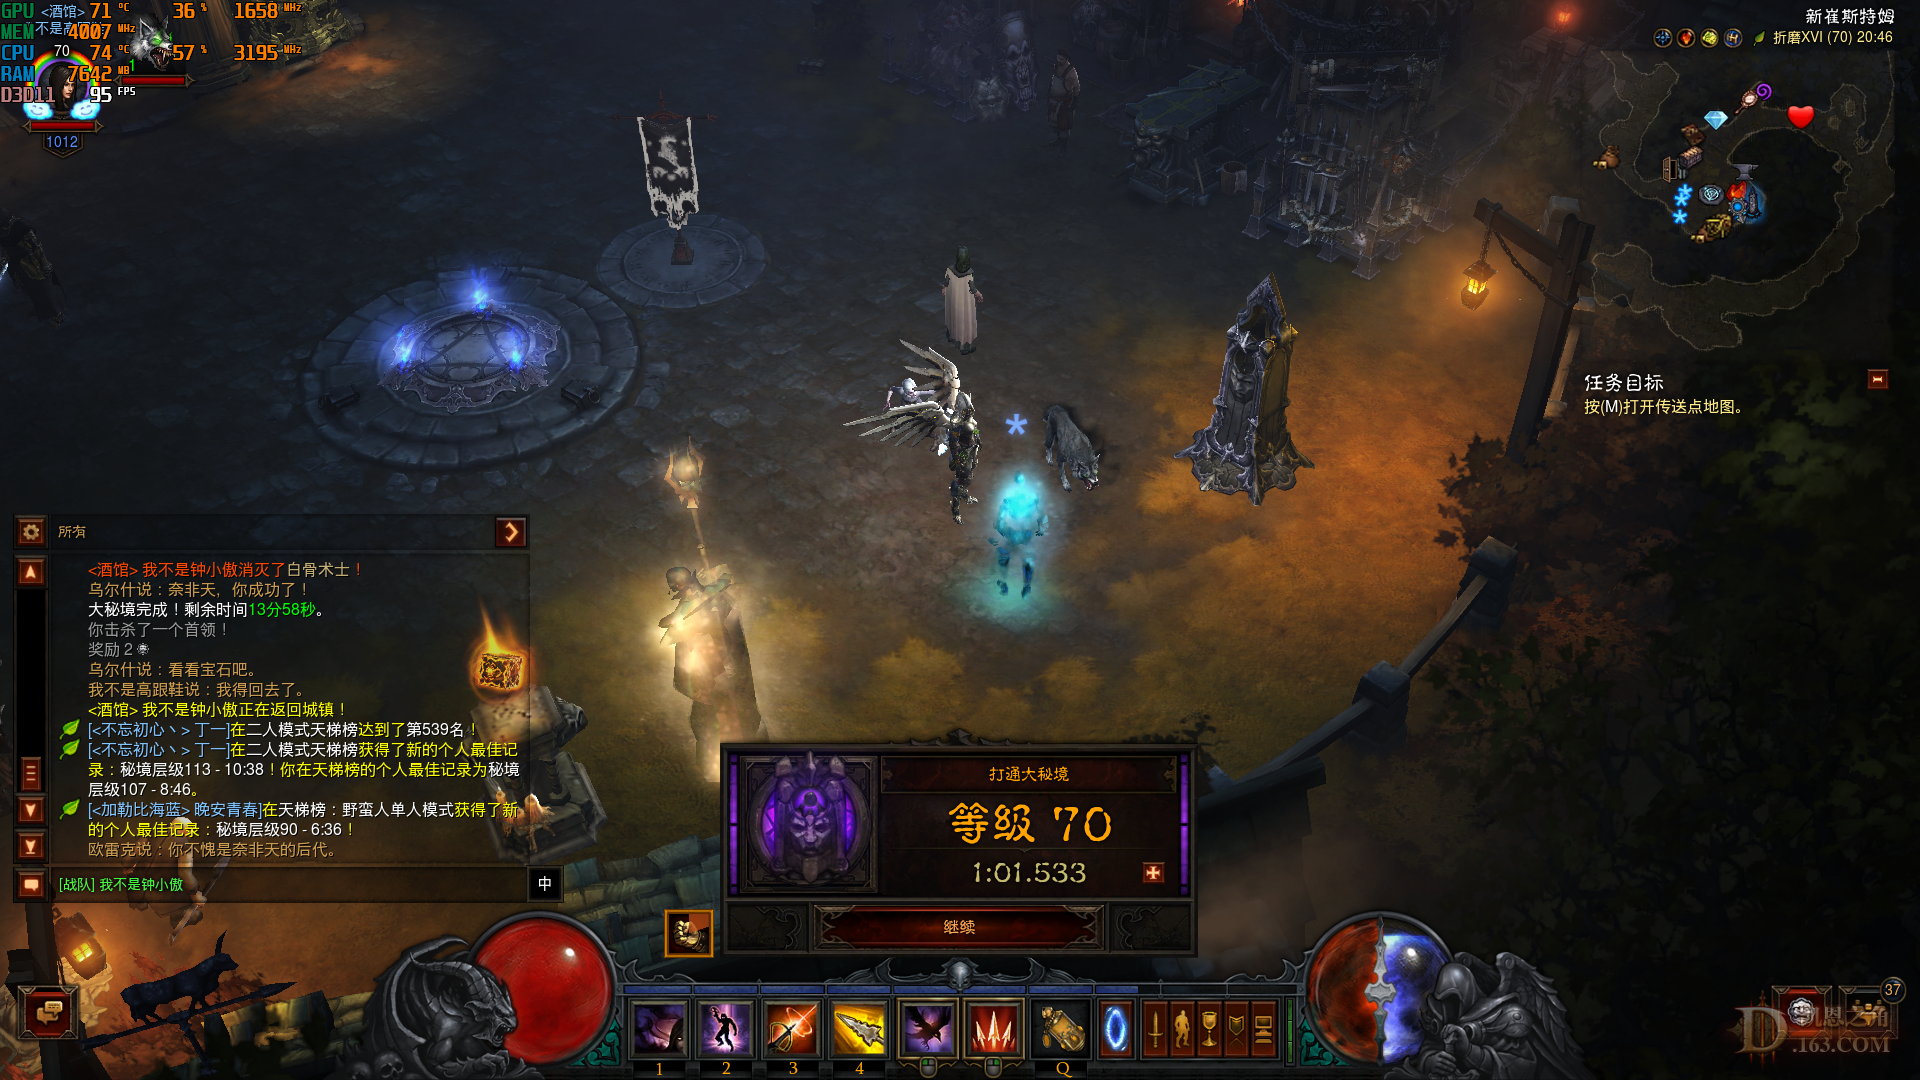 Diablo III Screenshot 2020.07.07 - 20.46.30.29.png